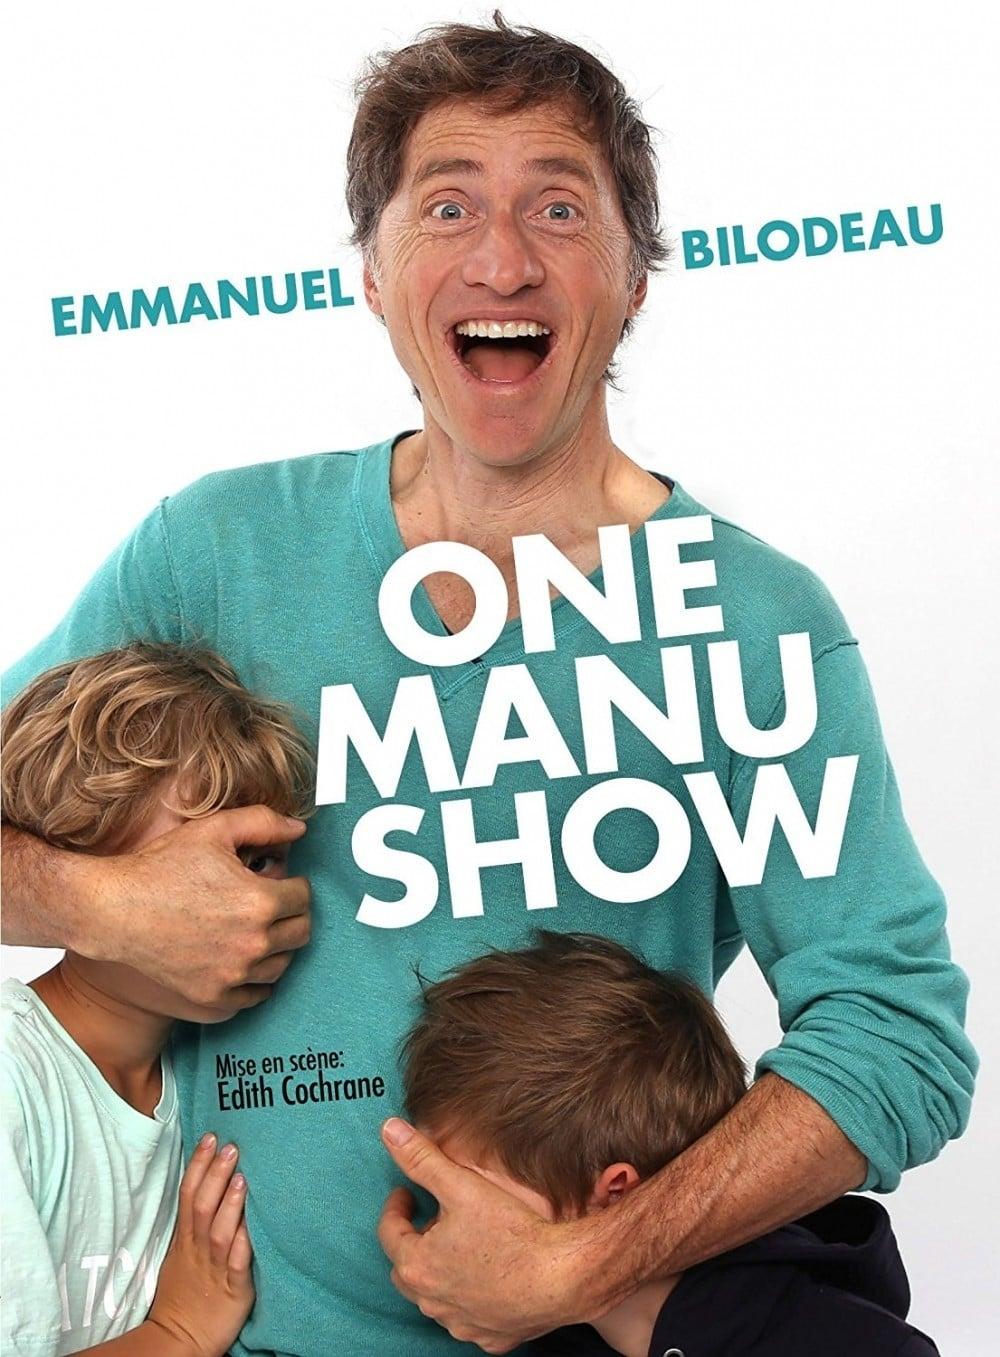 Emmanuel Bilodeau: One Manu Show (2017)